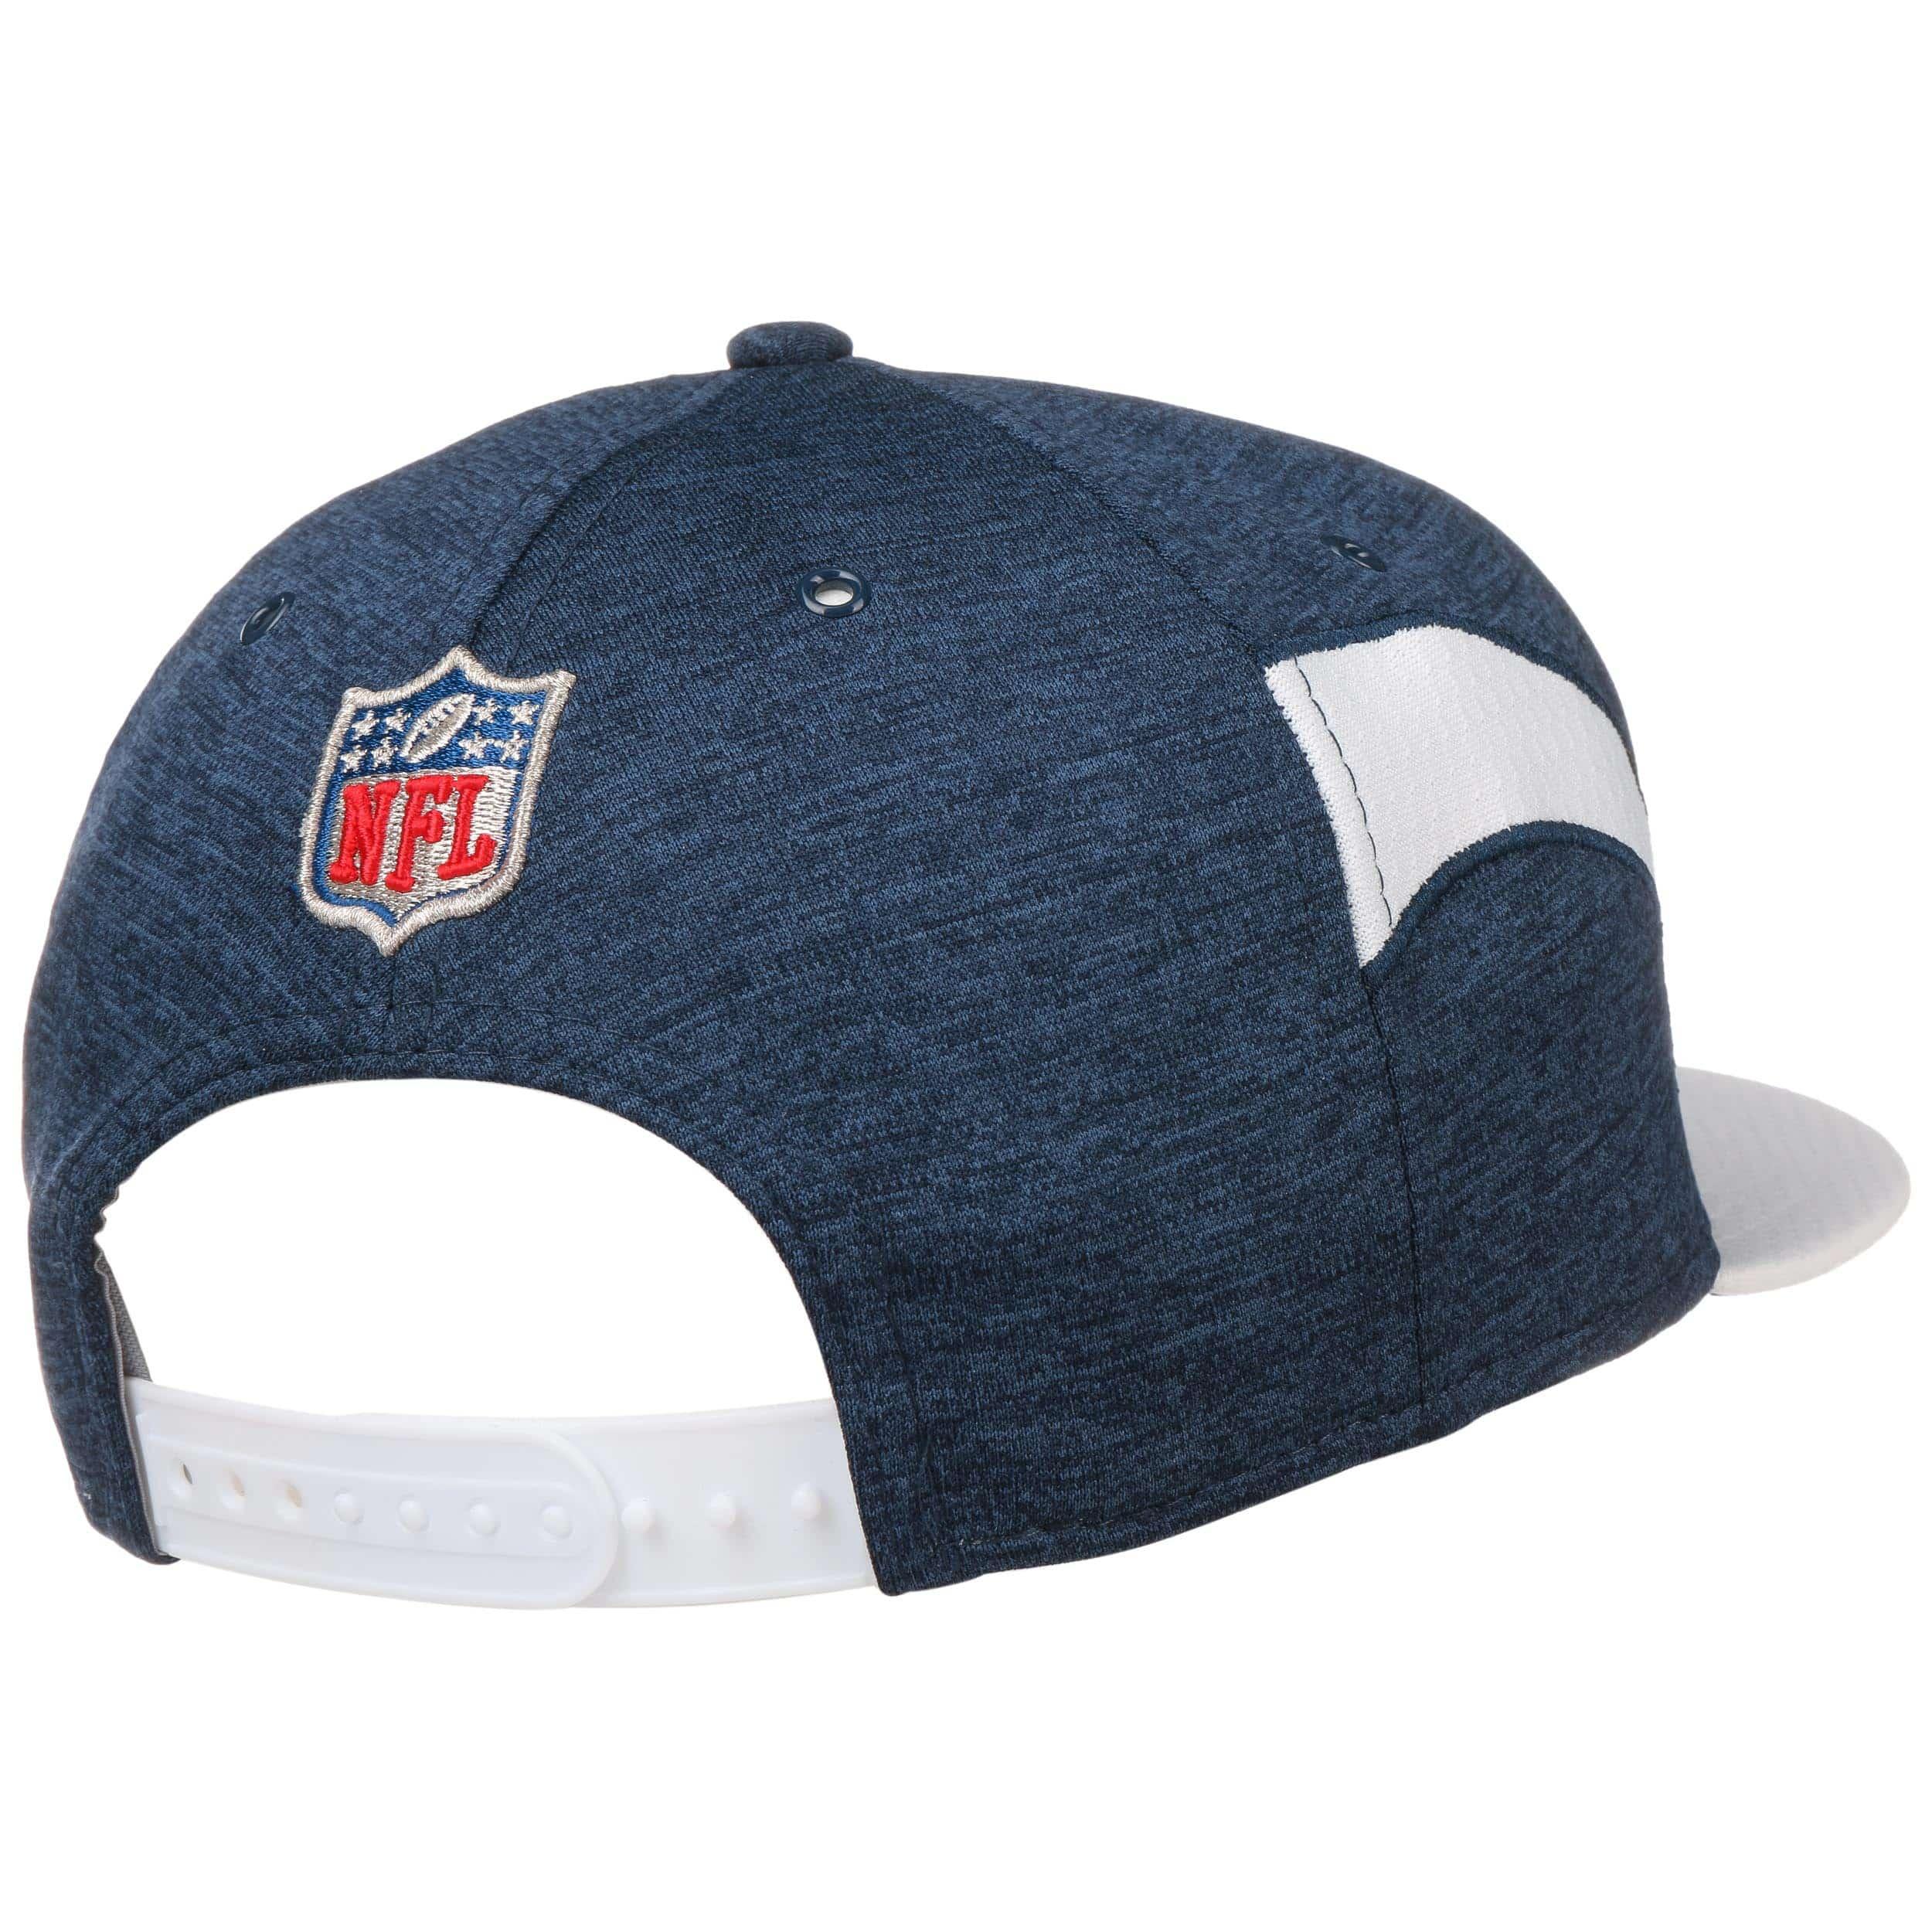 d7036fbae4fc5 Gorra 9Fifty On-Field 18 LA Rams by New Era - Gorras - sombreroshop.es